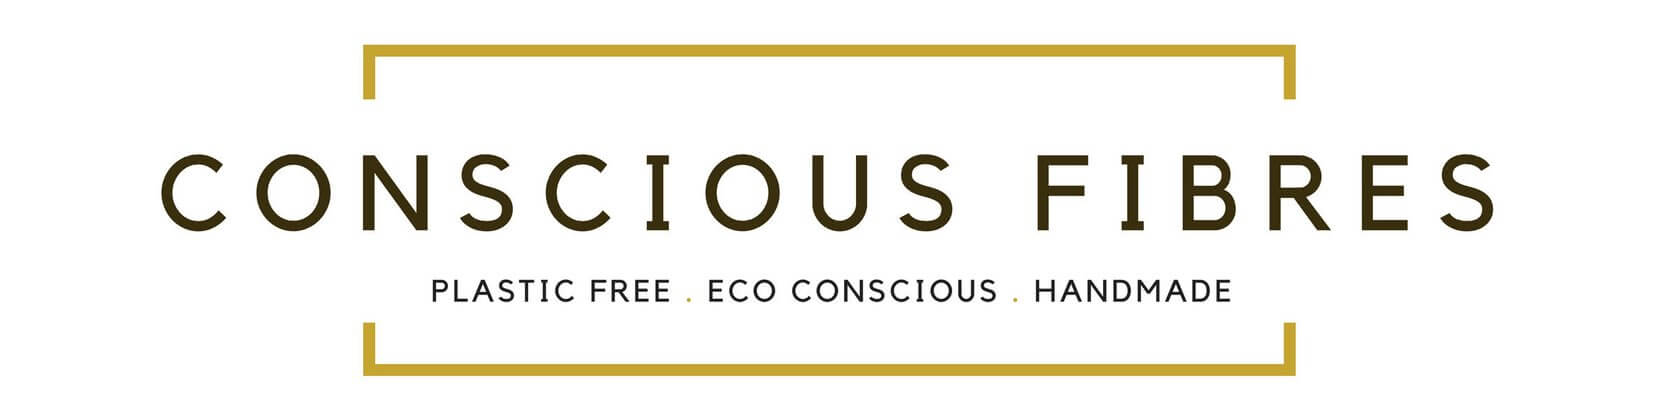 conscious fires